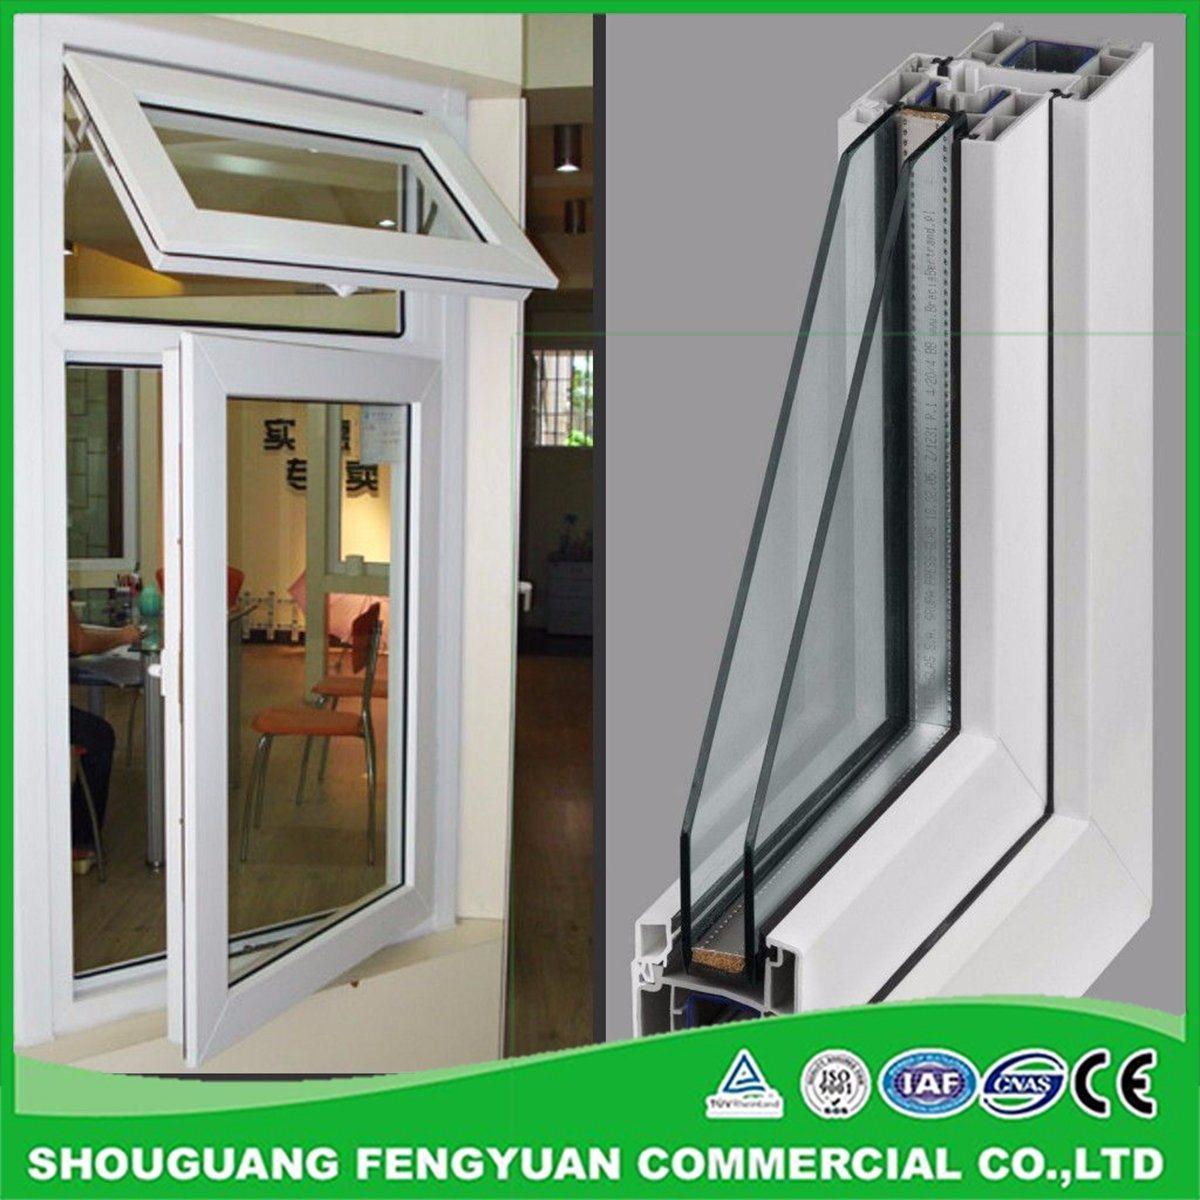 Energy-saving glass for plastic windows 21